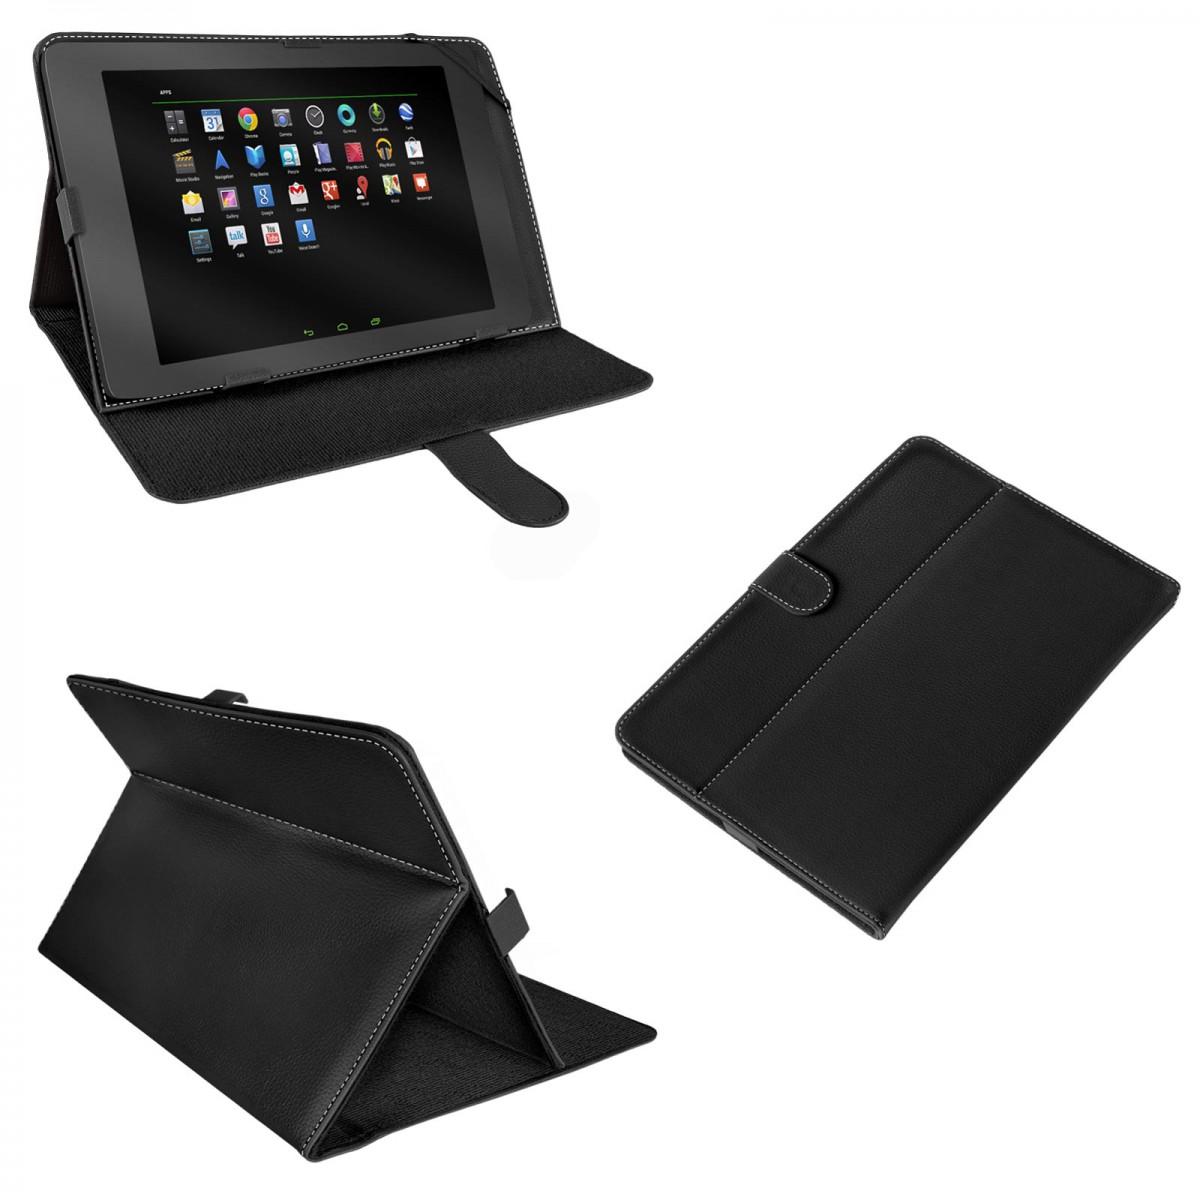 universal tablet tasche h lle f r 10 10 1 zoll tablet schutztasche schutzh lle cover case schwarz. Black Bedroom Furniture Sets. Home Design Ideas